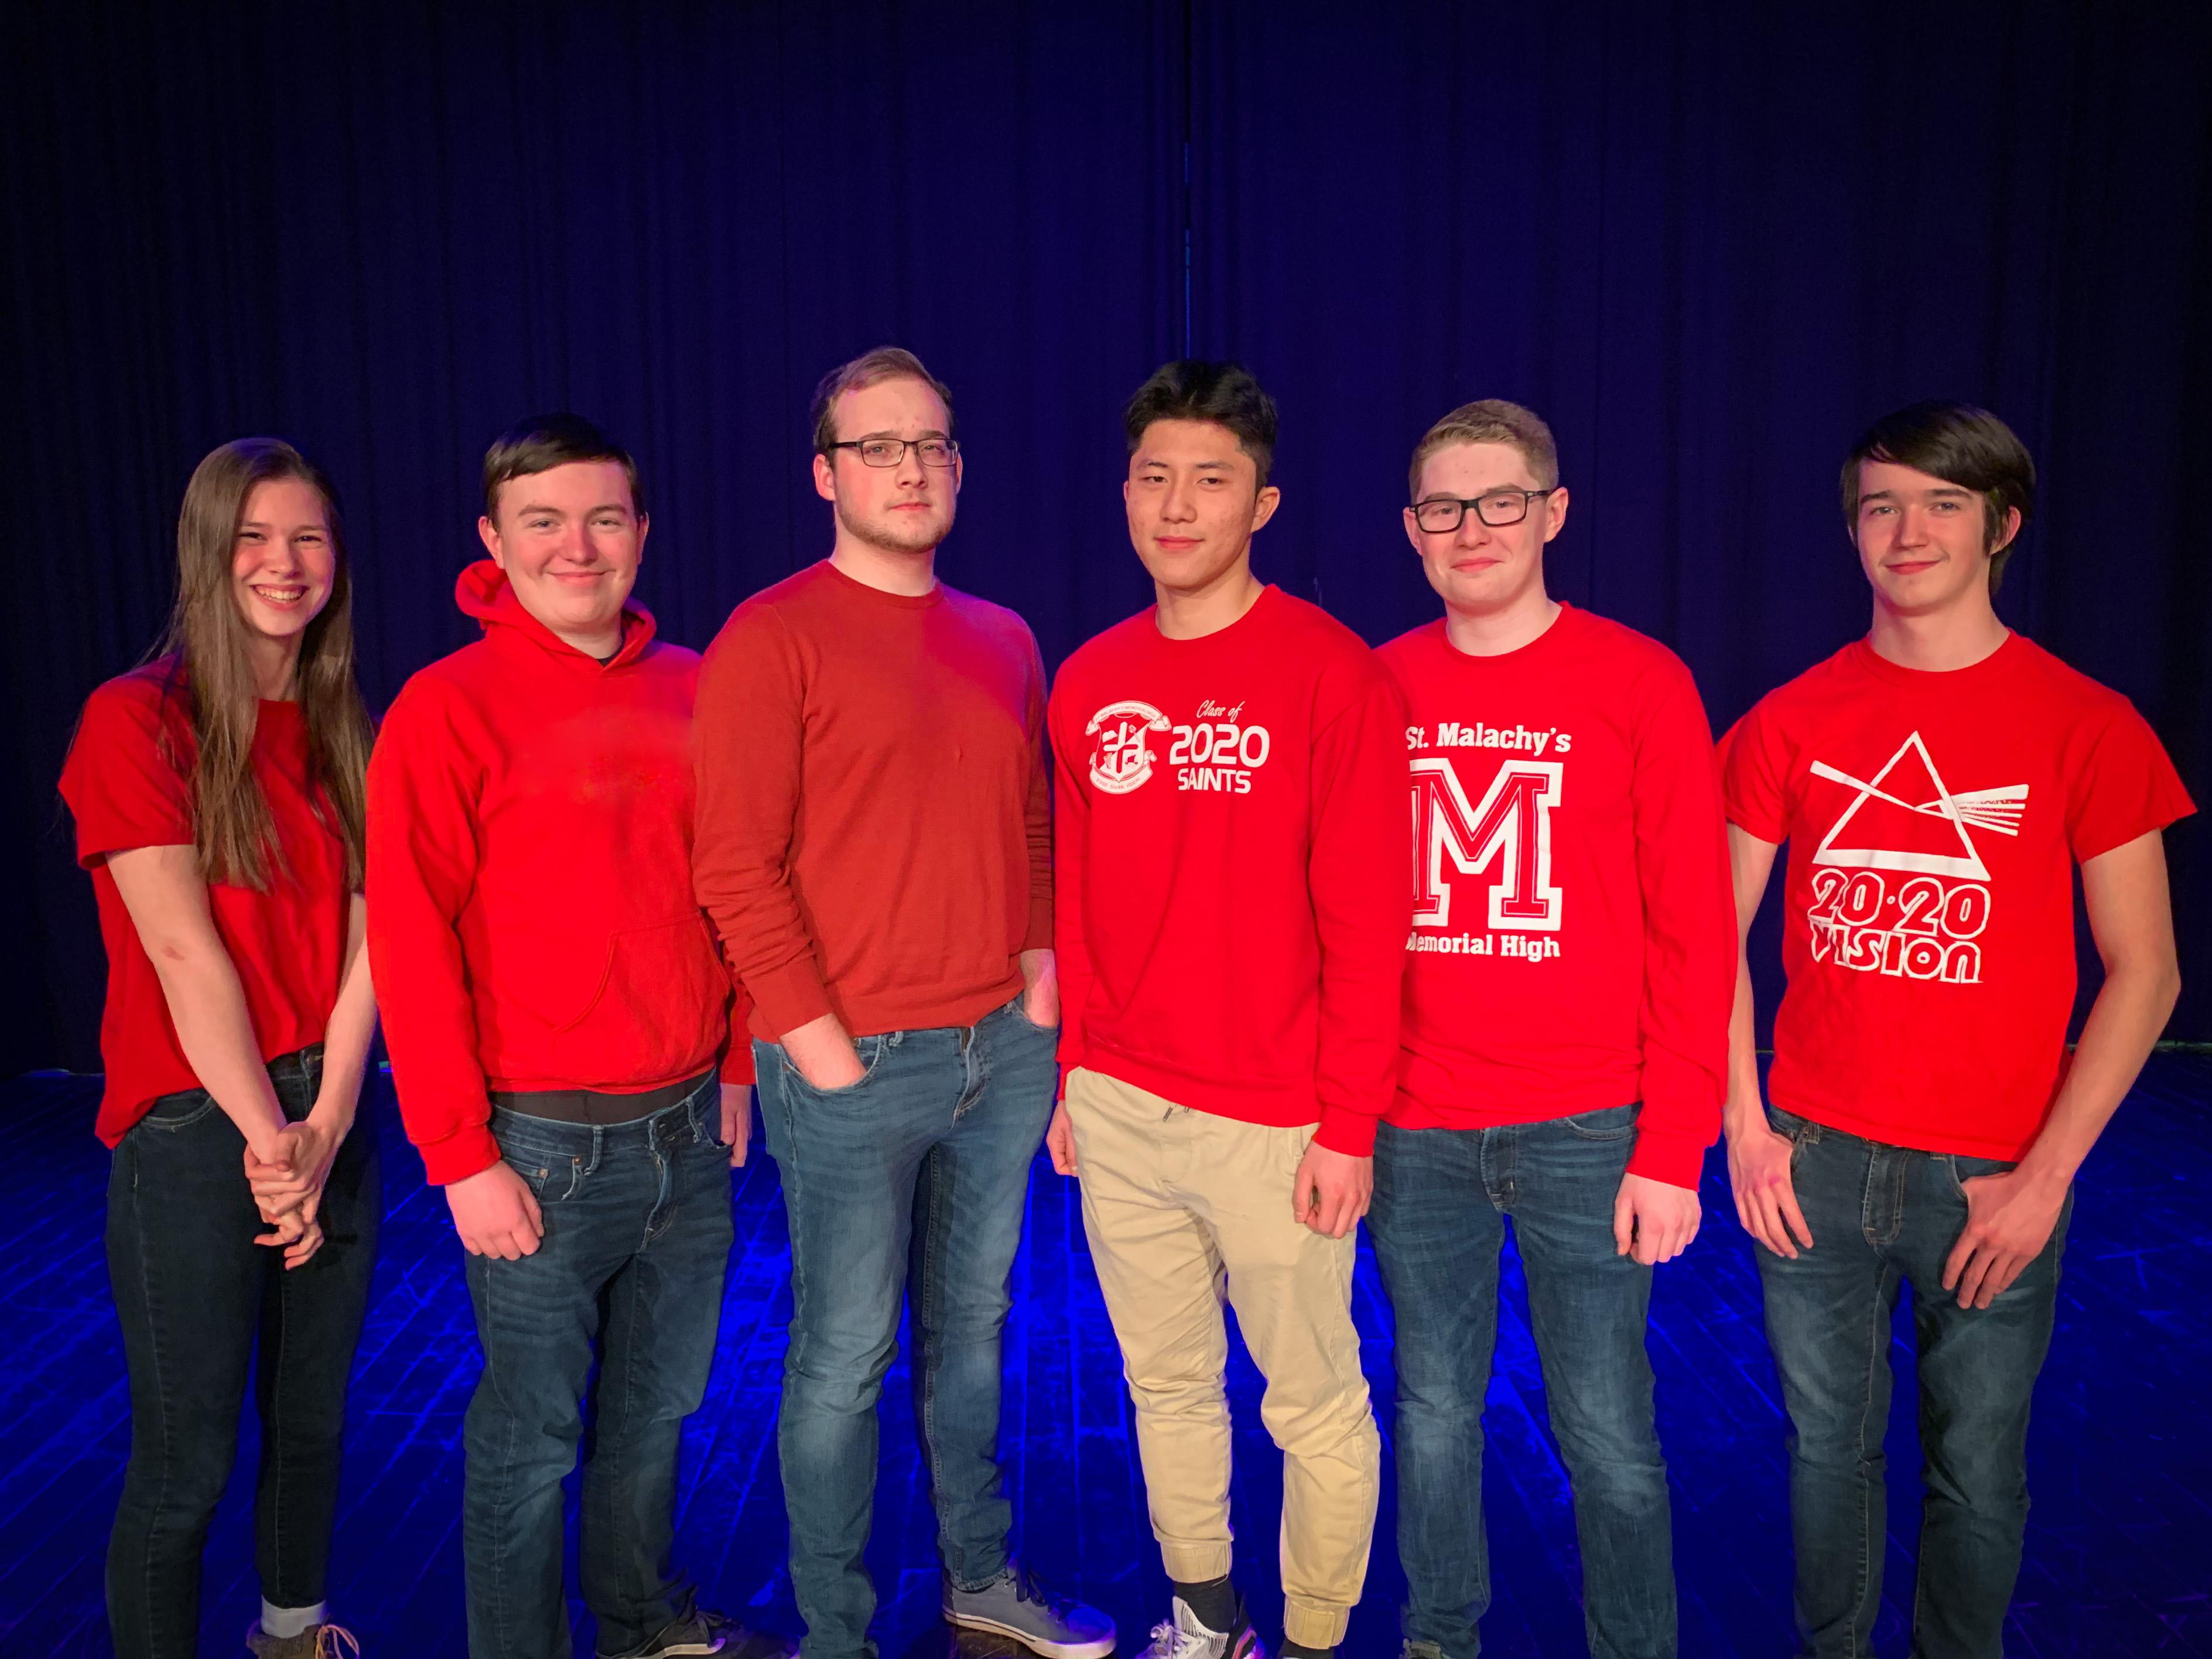 Meet the CyberTitans: Team Saints